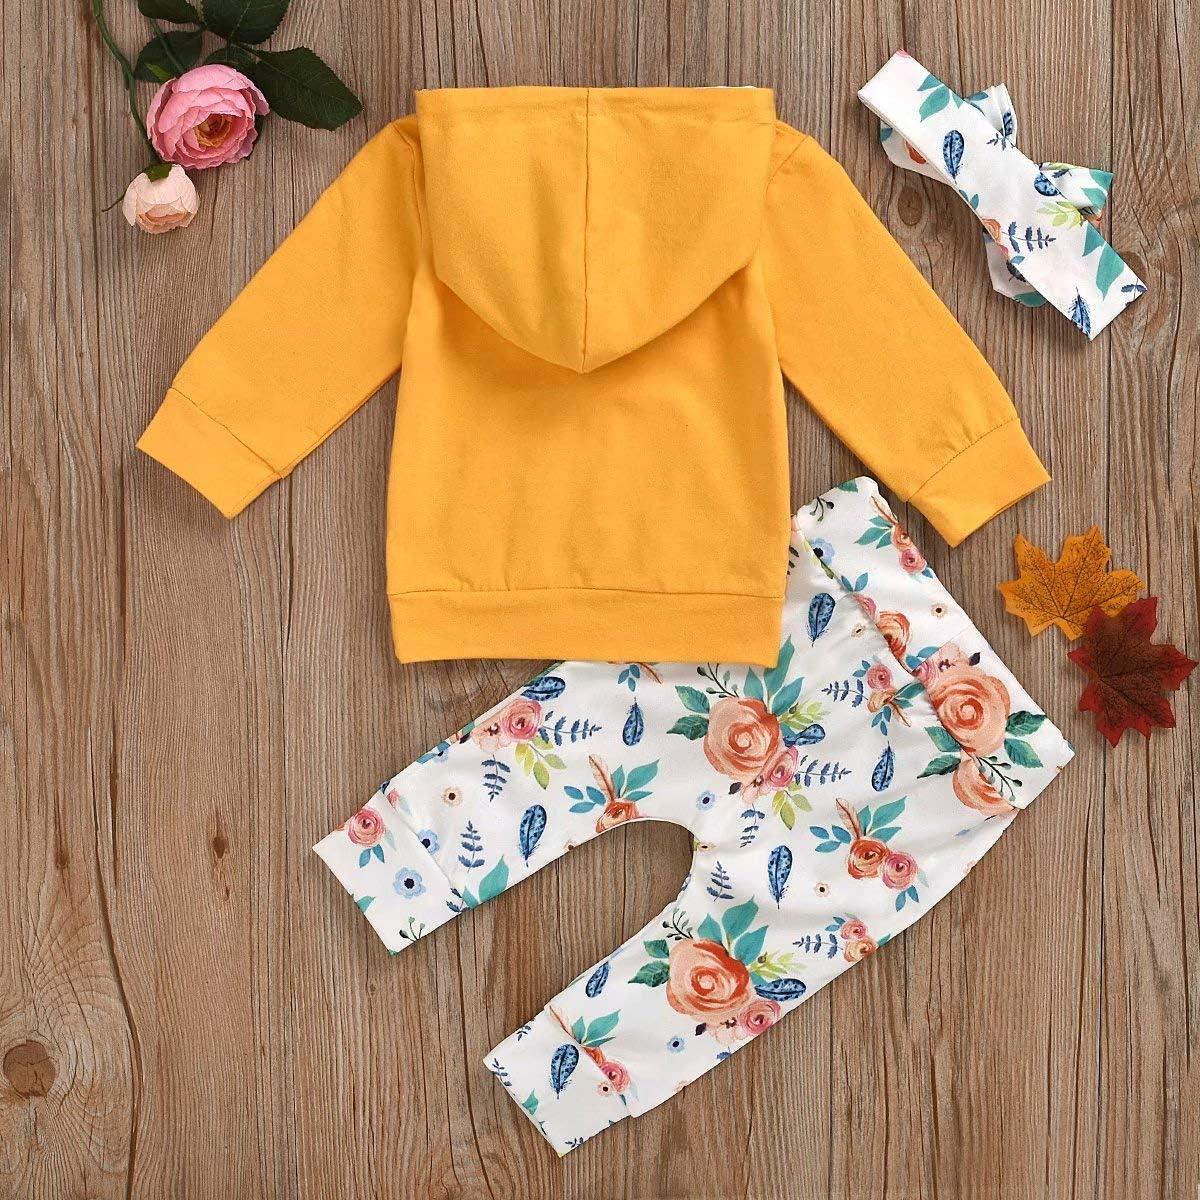 Pantalones Trajes DaceStar Reci/én Nacido Ni/ñas Ropa 3PCs Conjunto de Trajes con Manga Larga Floral Sudadera Tops